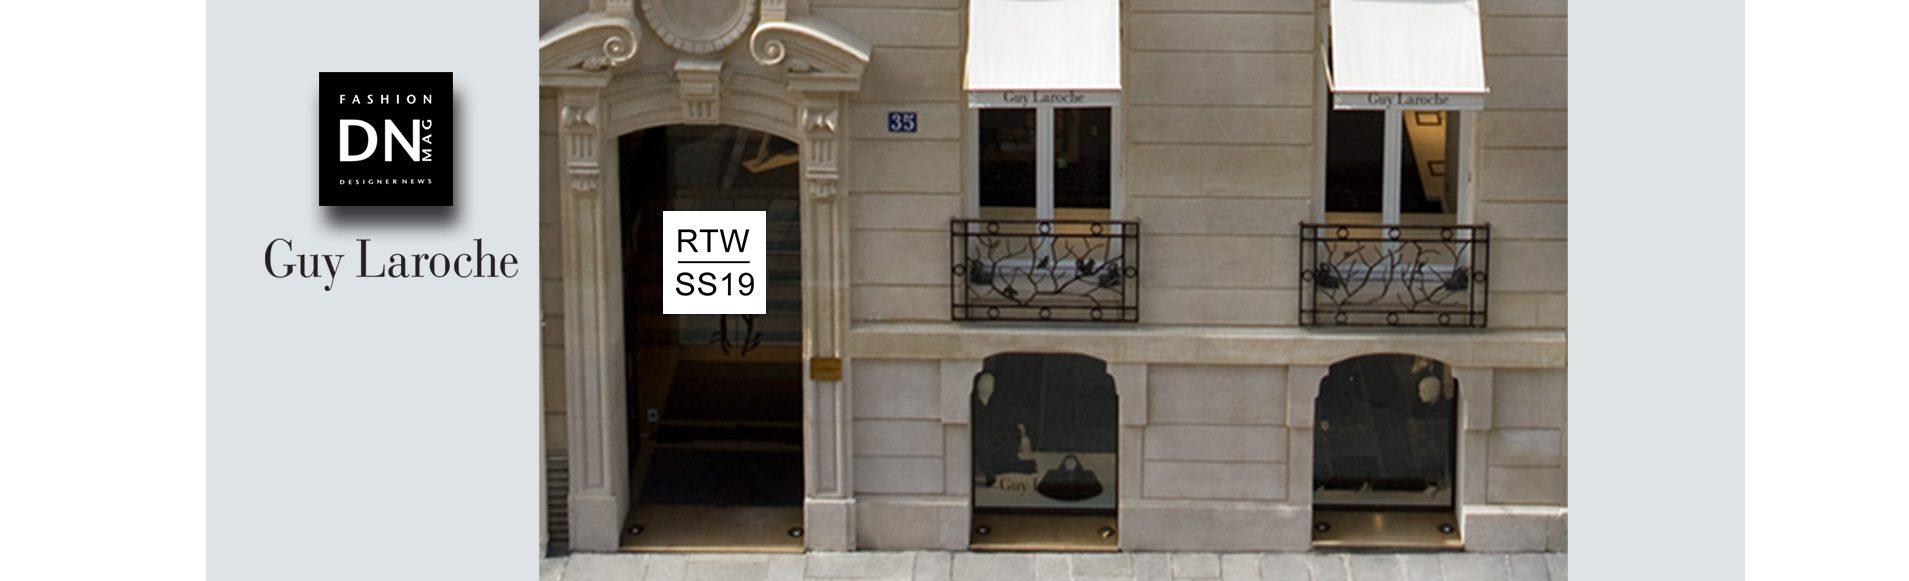 DNMAG-GUY-LAROCHE-PFW-RTW-SS19